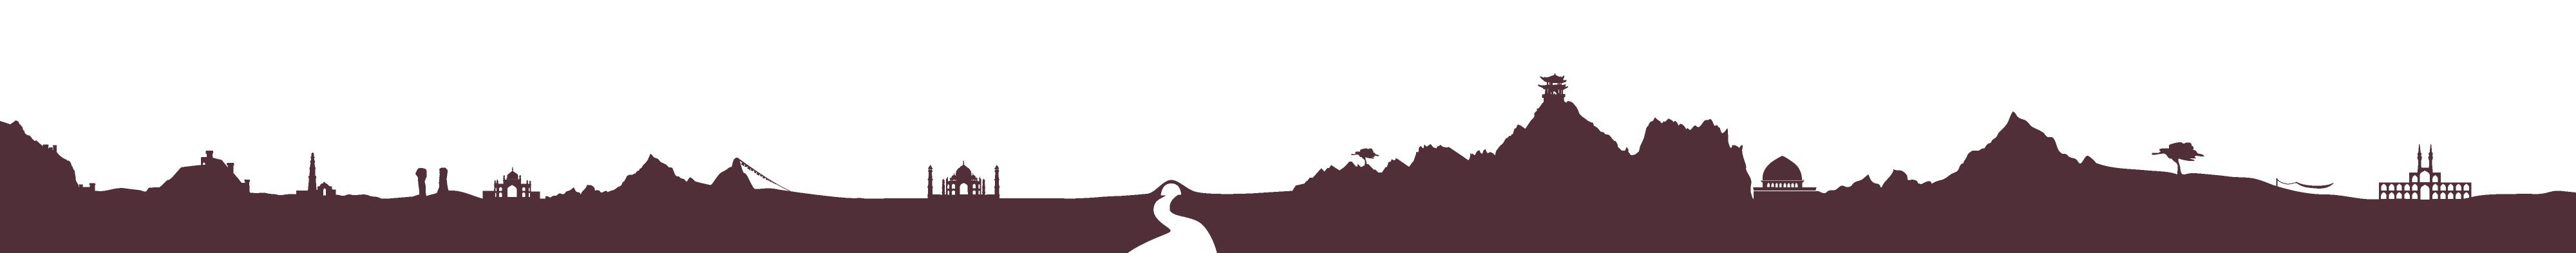 Rebrand including illustration for Oakham Rugs in Rutland